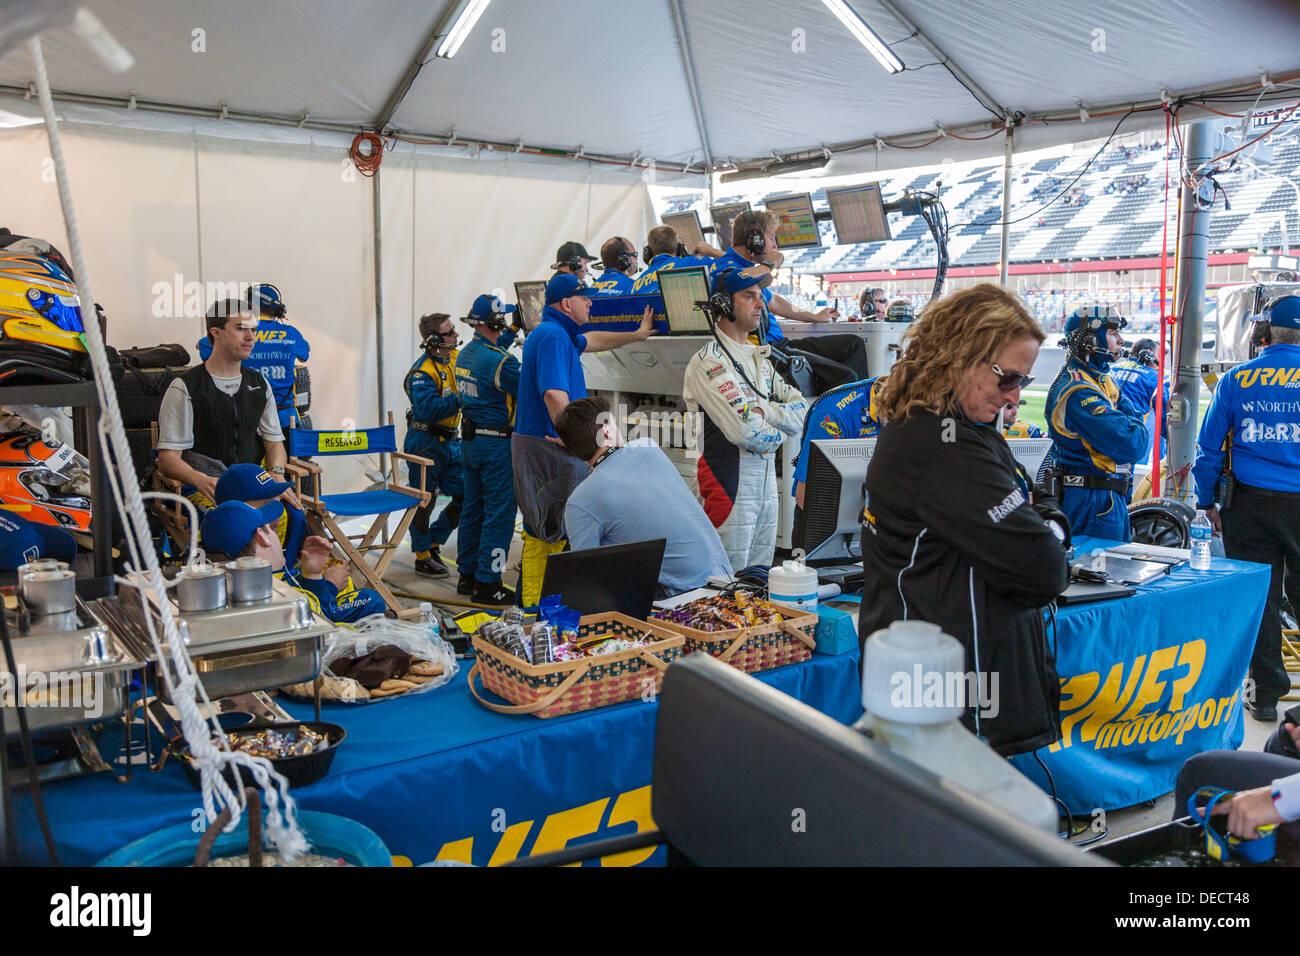 Turner Motorsports pit crew at Daytona International Speedway during the 2012 Rolex 24 at Daytona, Florida - Stock Image